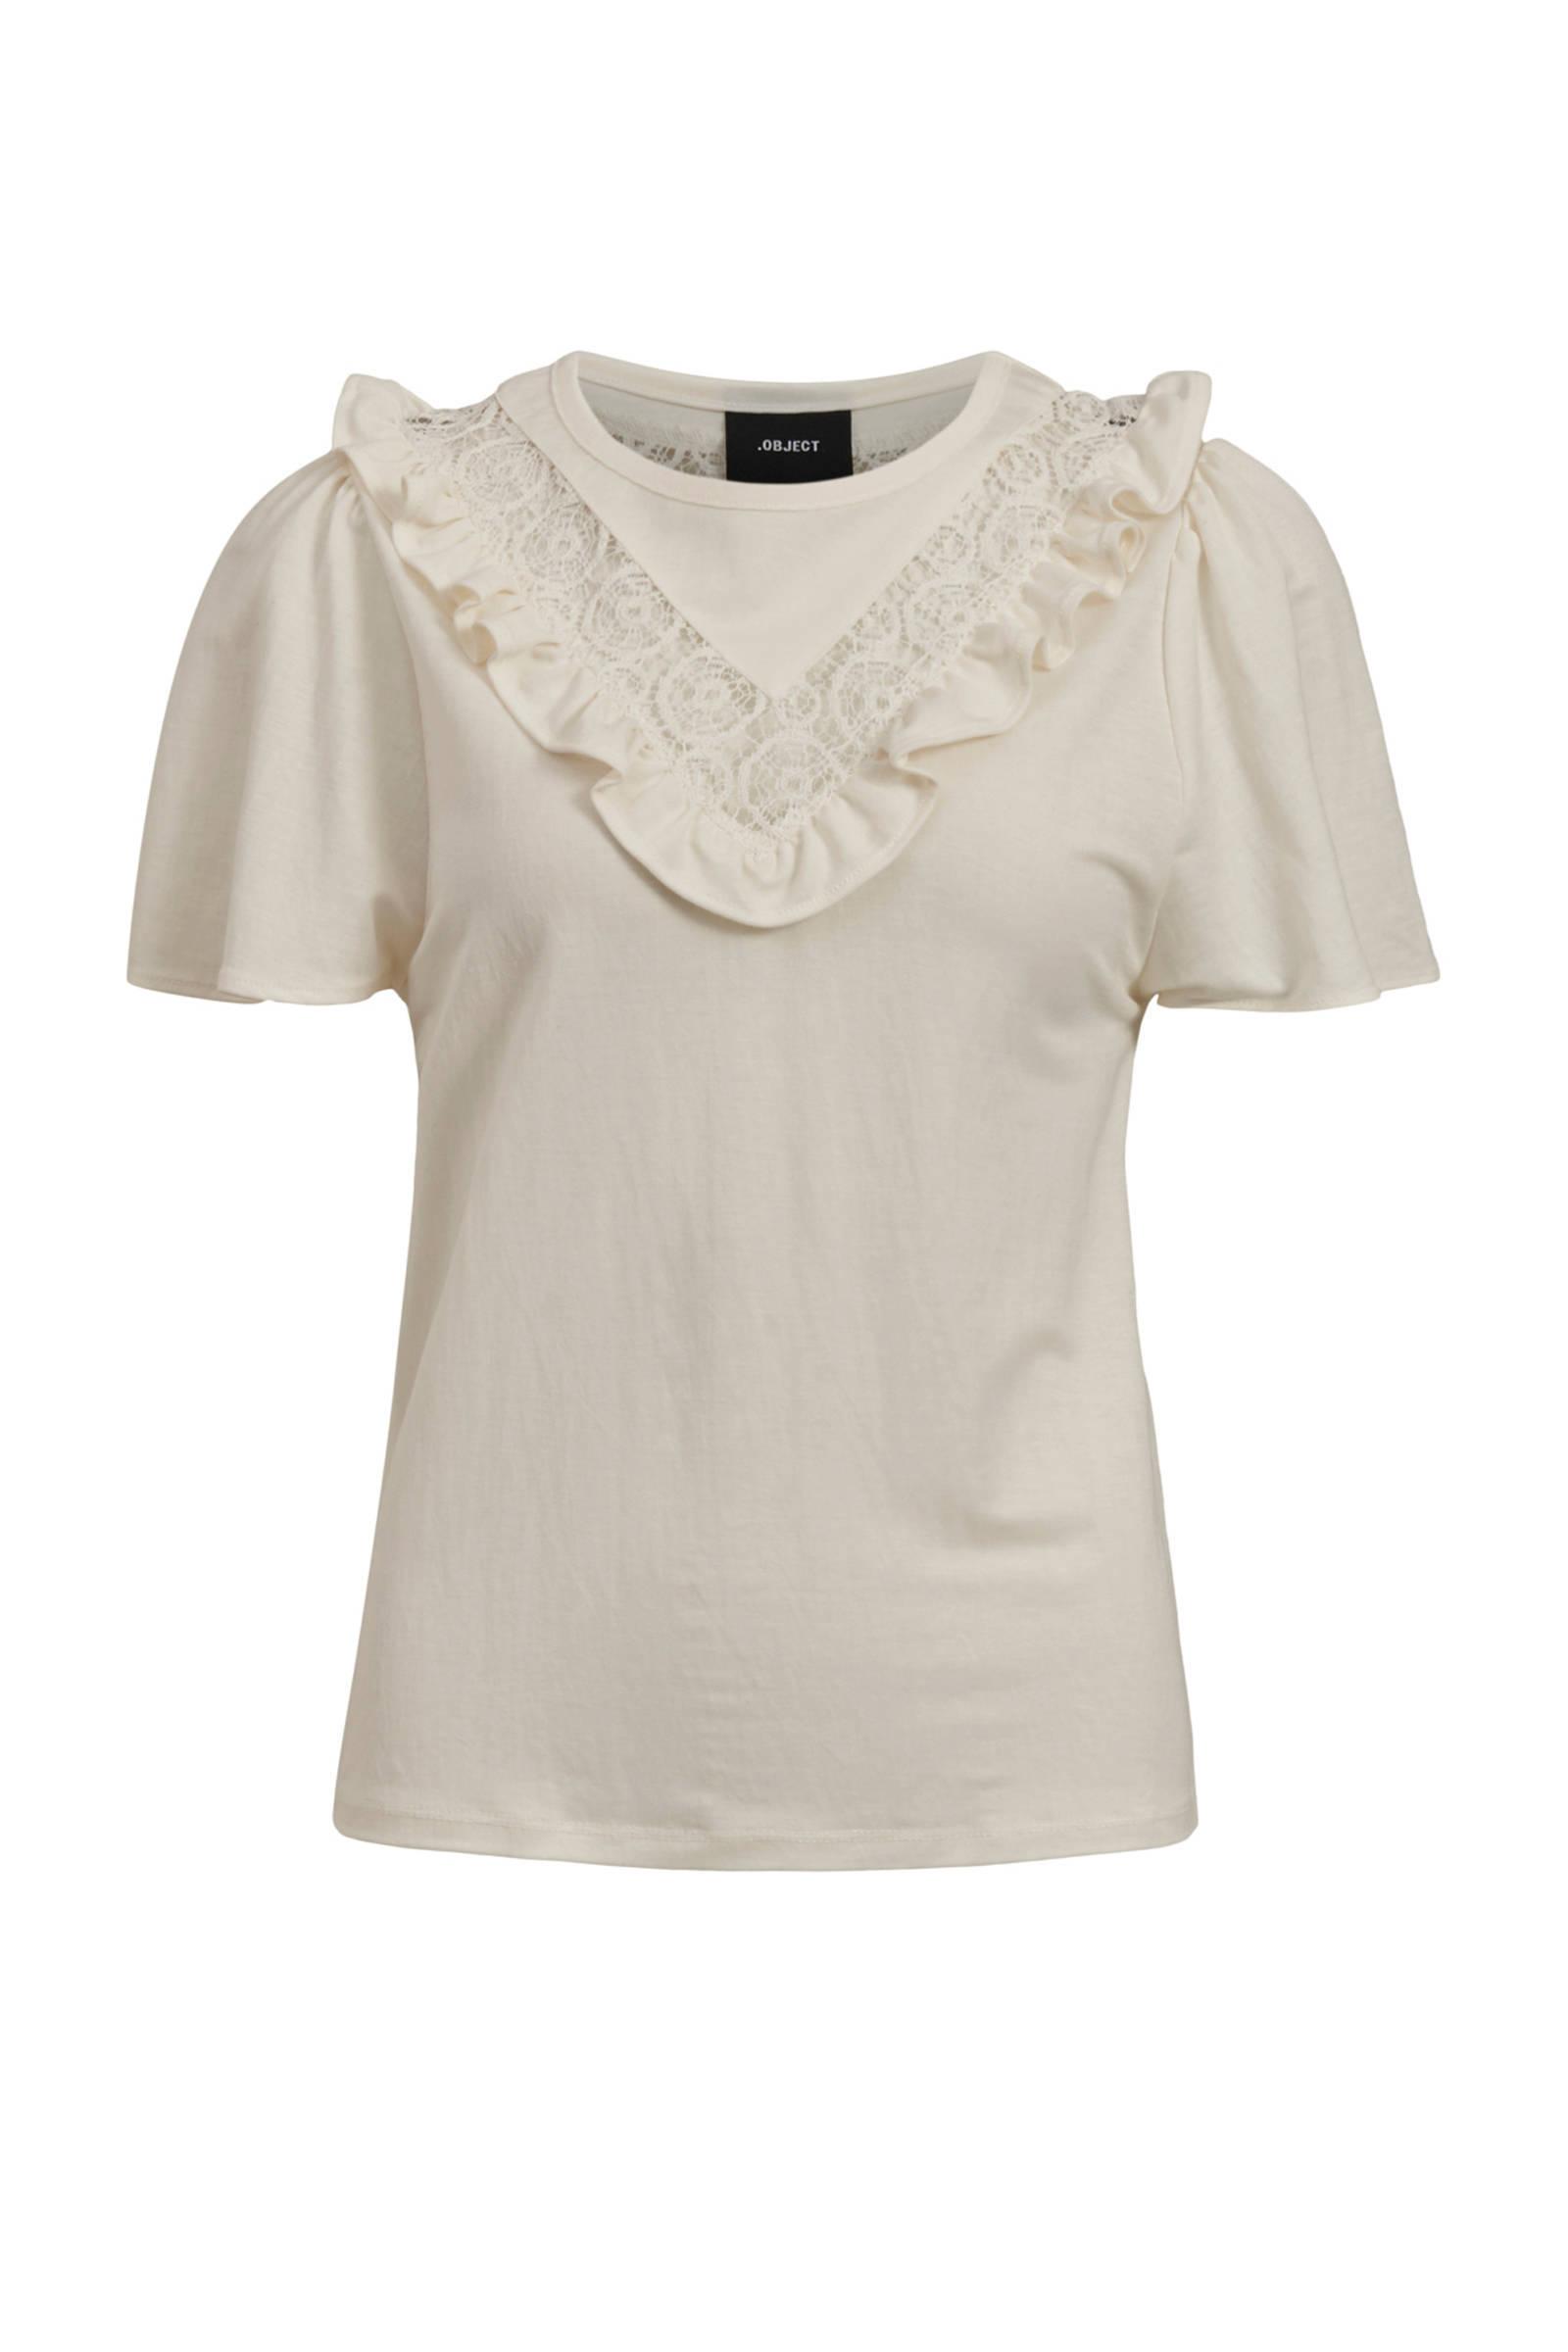 Sale: OBJECT kleding voor dames kopen Vind jouw Sale